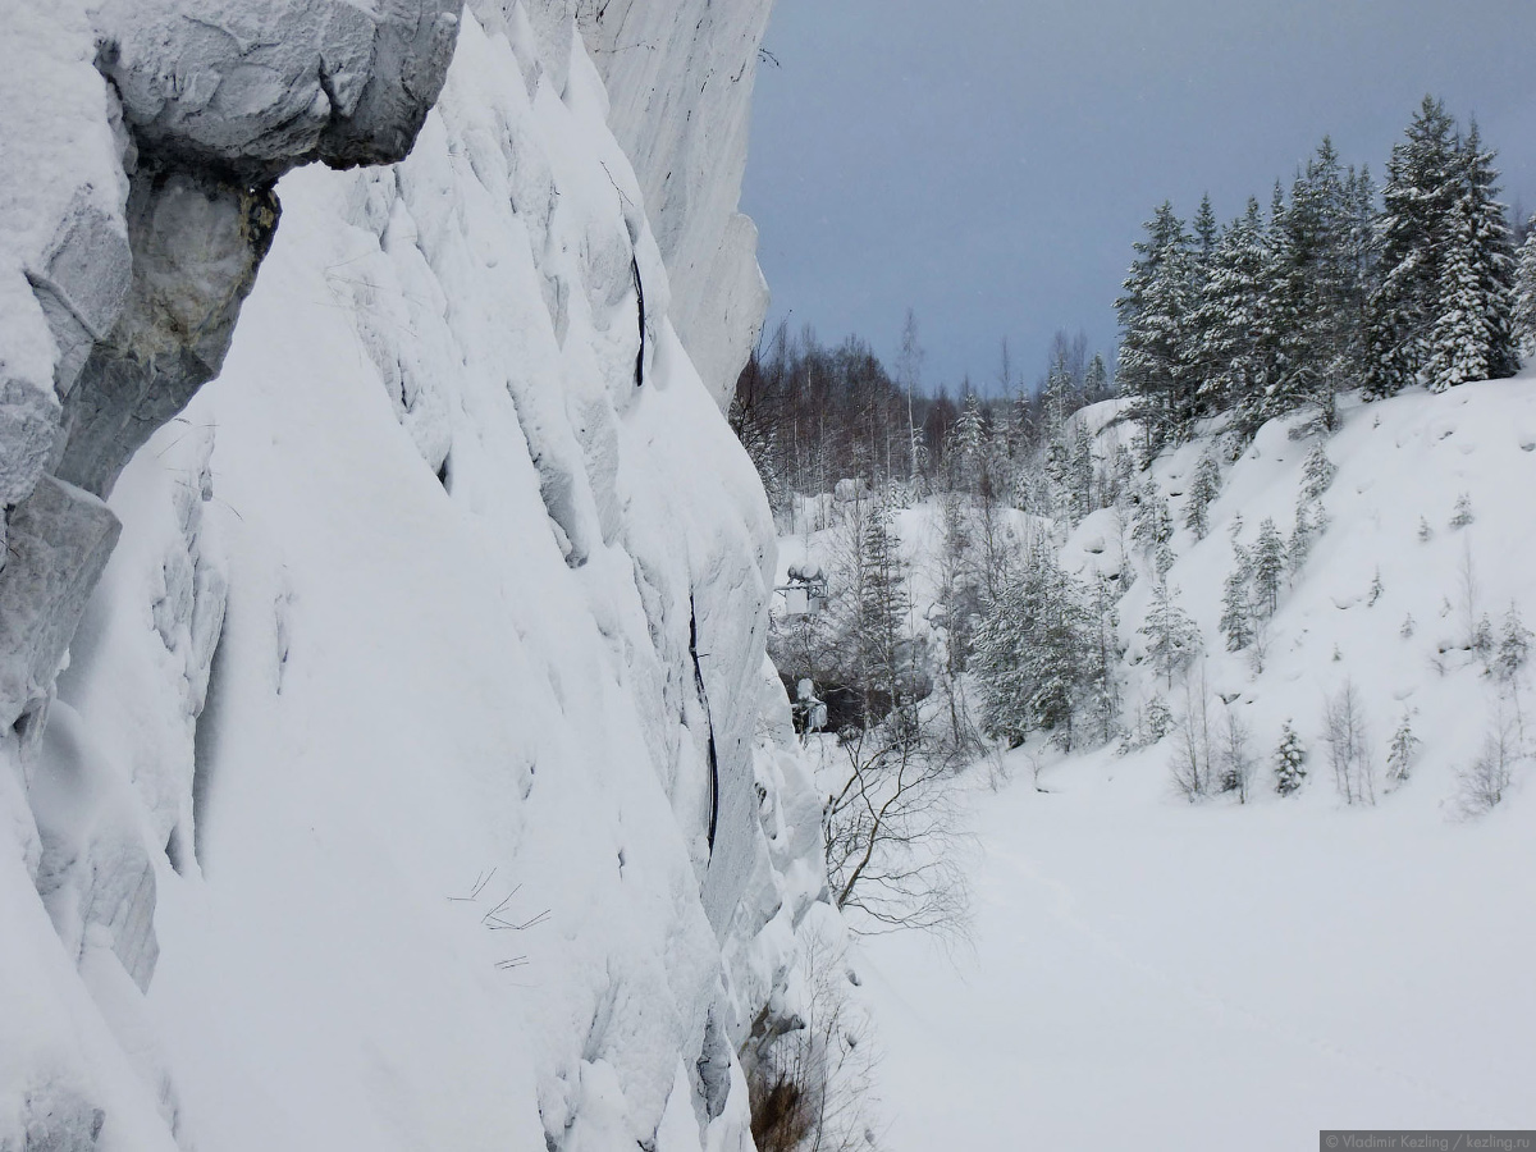 Via Karelia. Рускеала зимой